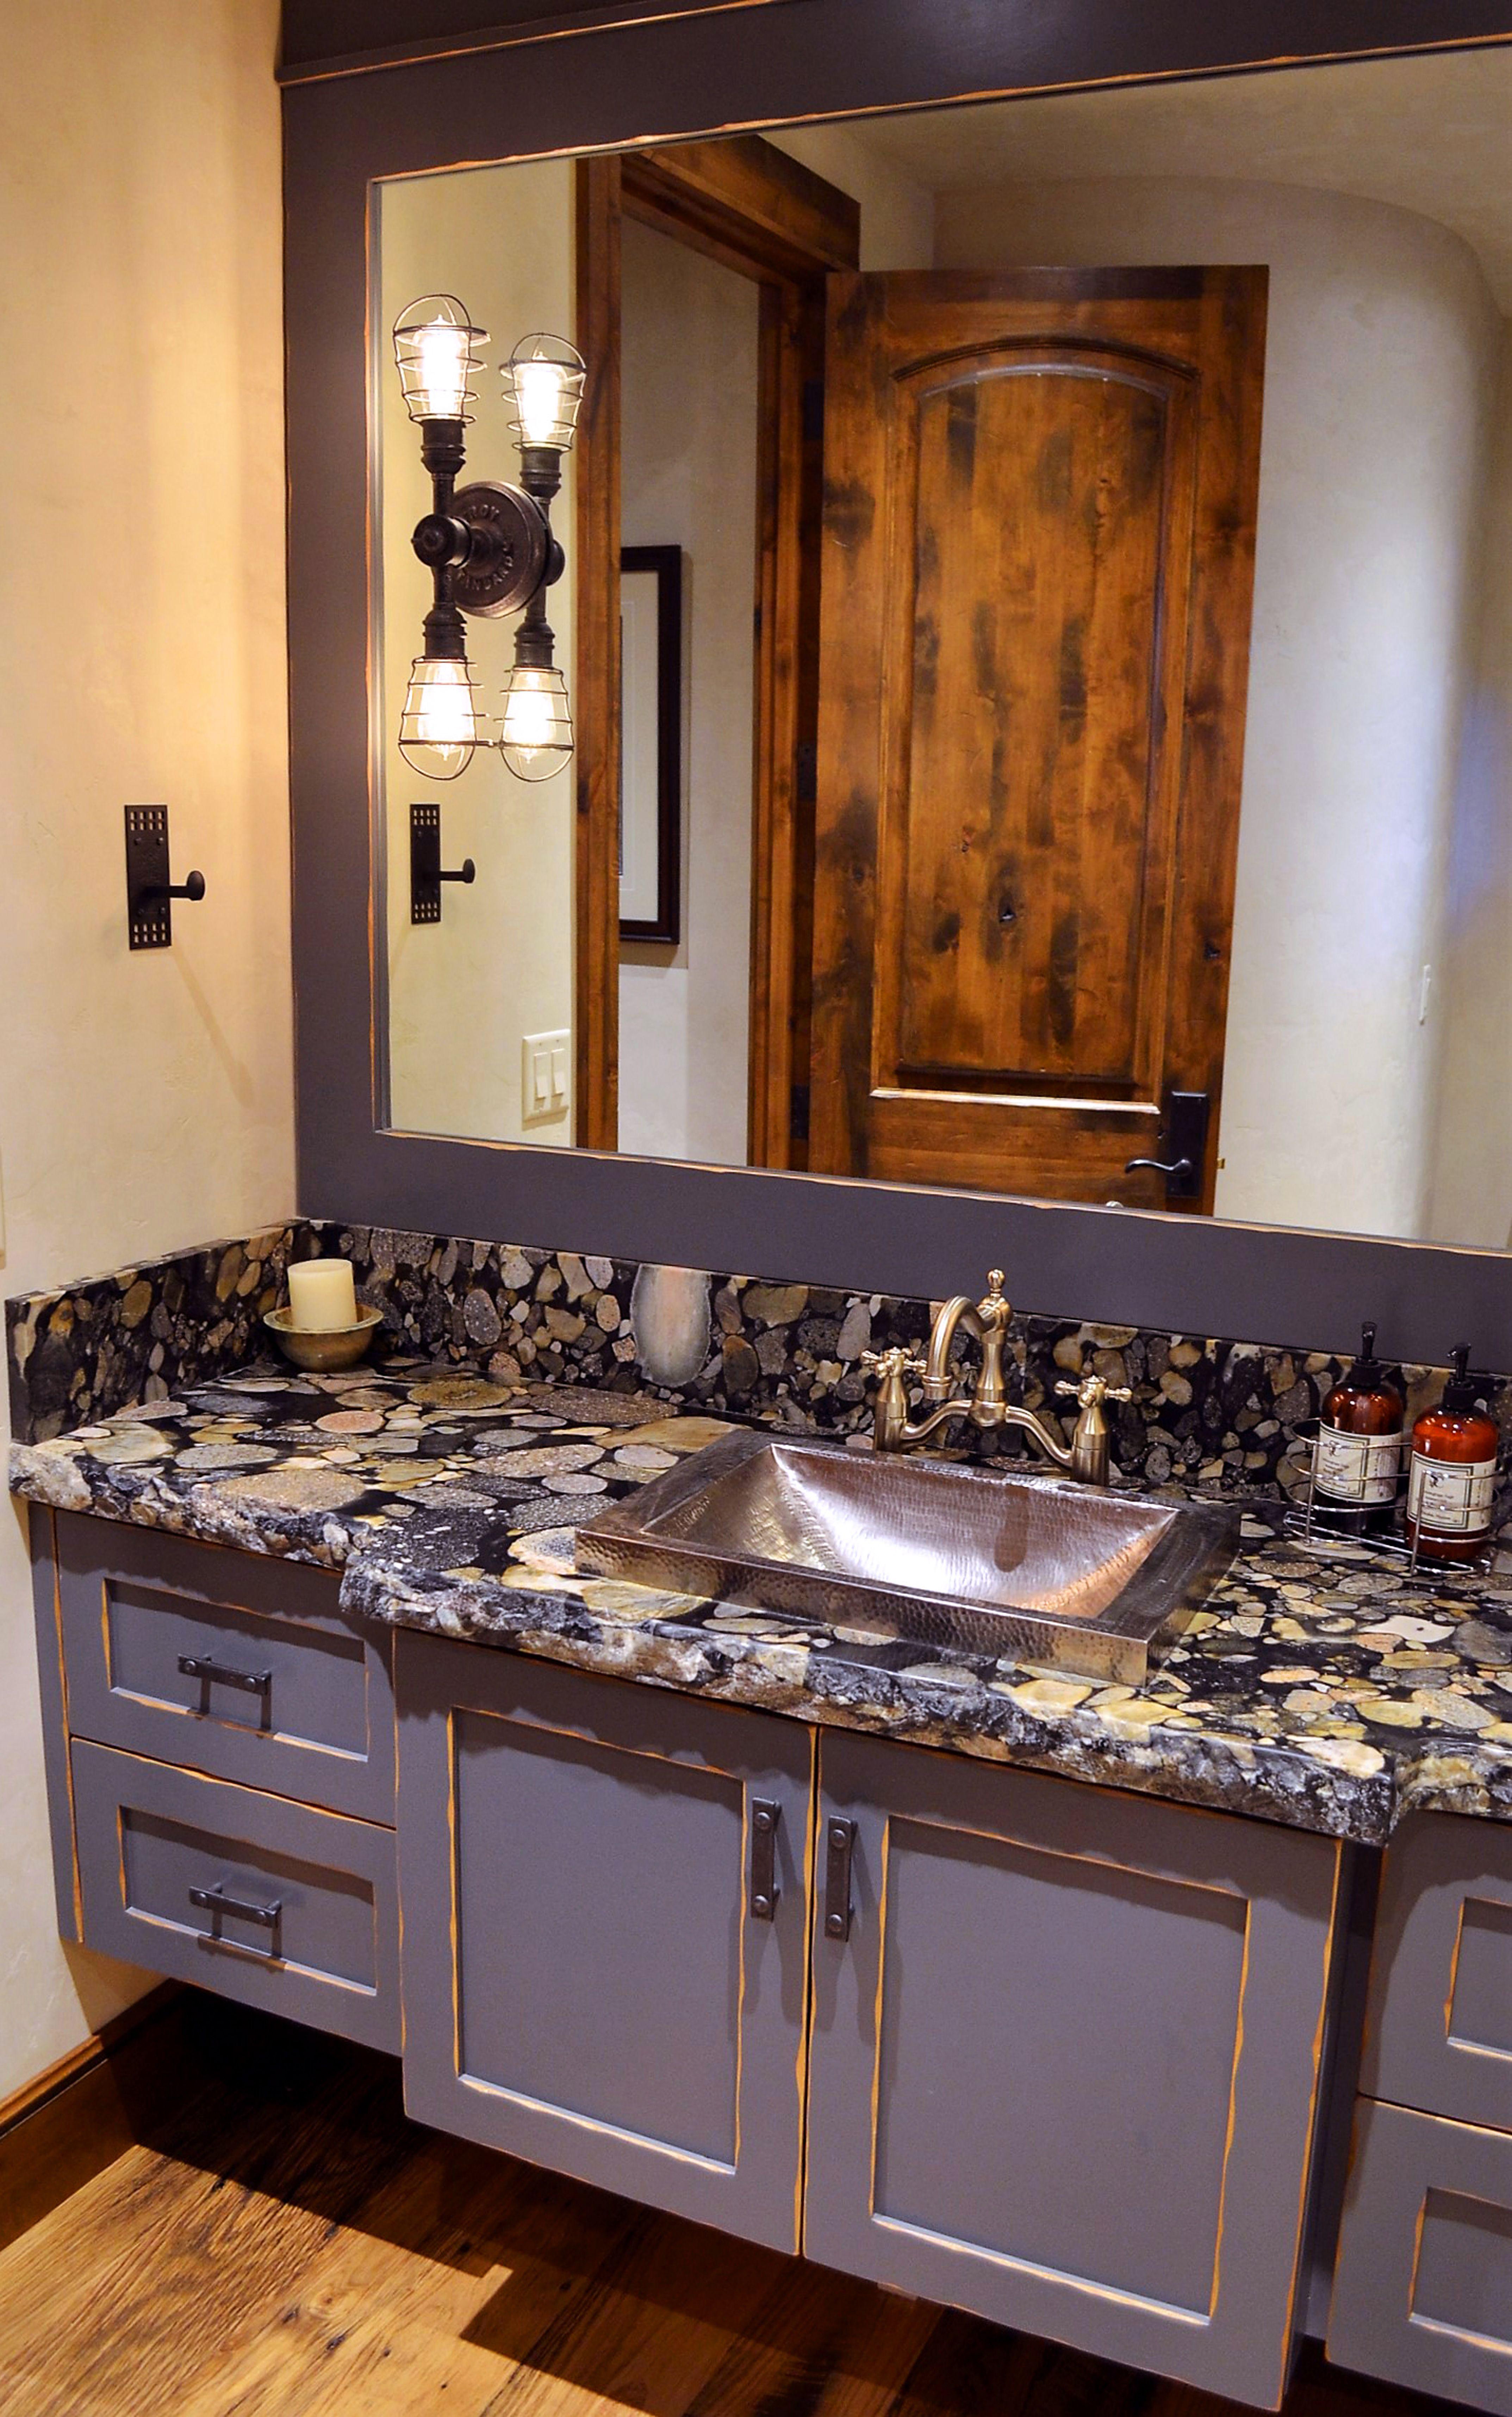 Blue Cabinets Guest Bathroom Trough Sink River Rock Granite Industrial Lighting Montana Master Bath Sink Trough Sink Blue Cabinets